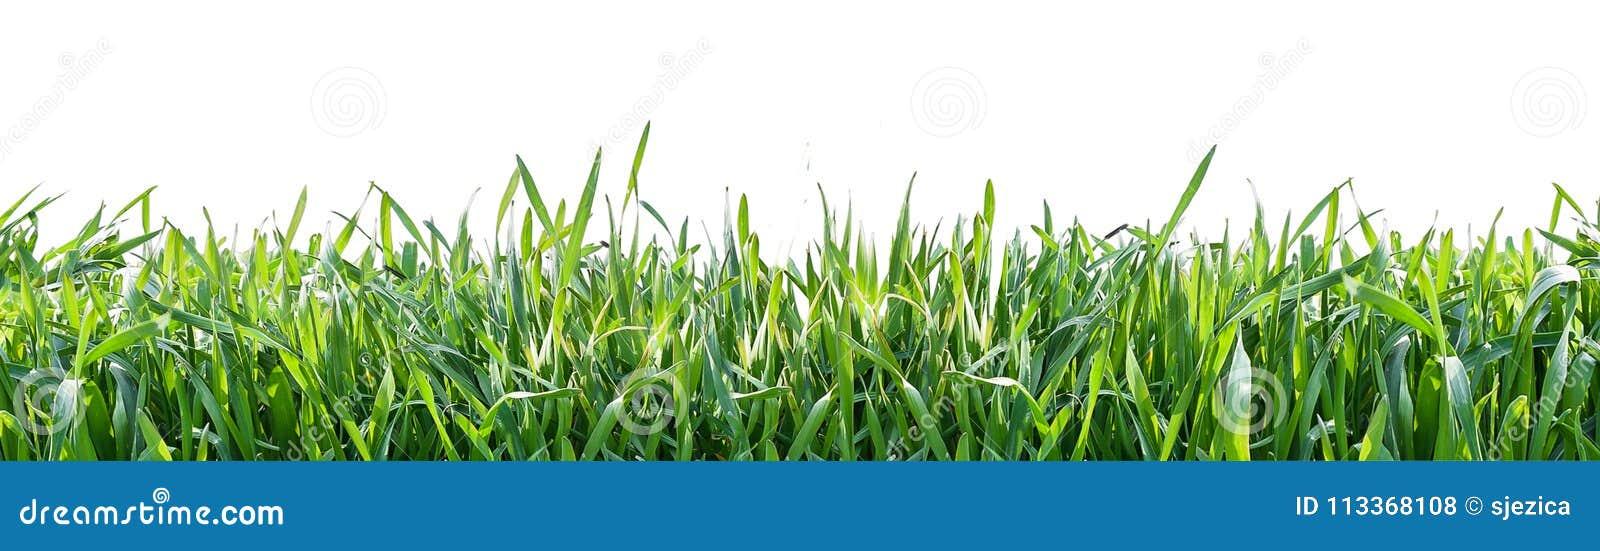 Grama verde isolada no fundo branco Fundo natural